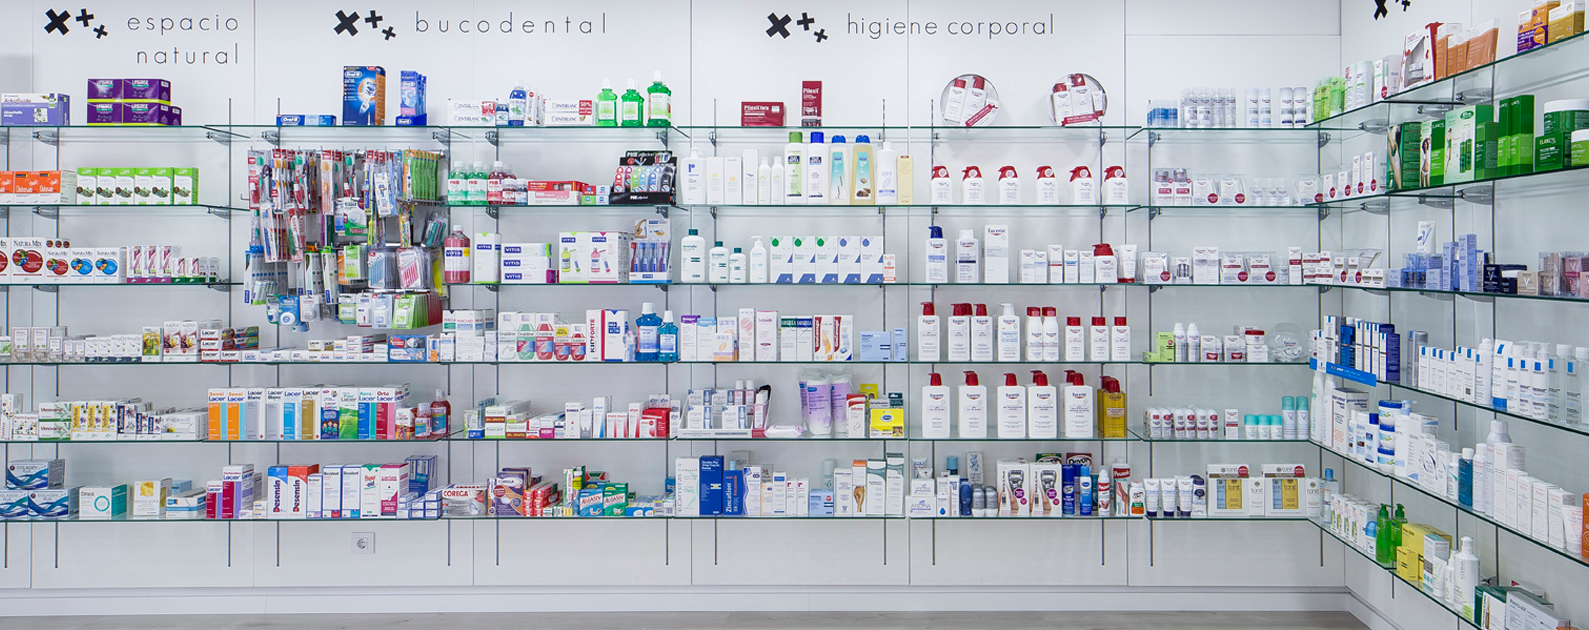 farmacias sempere Valencia